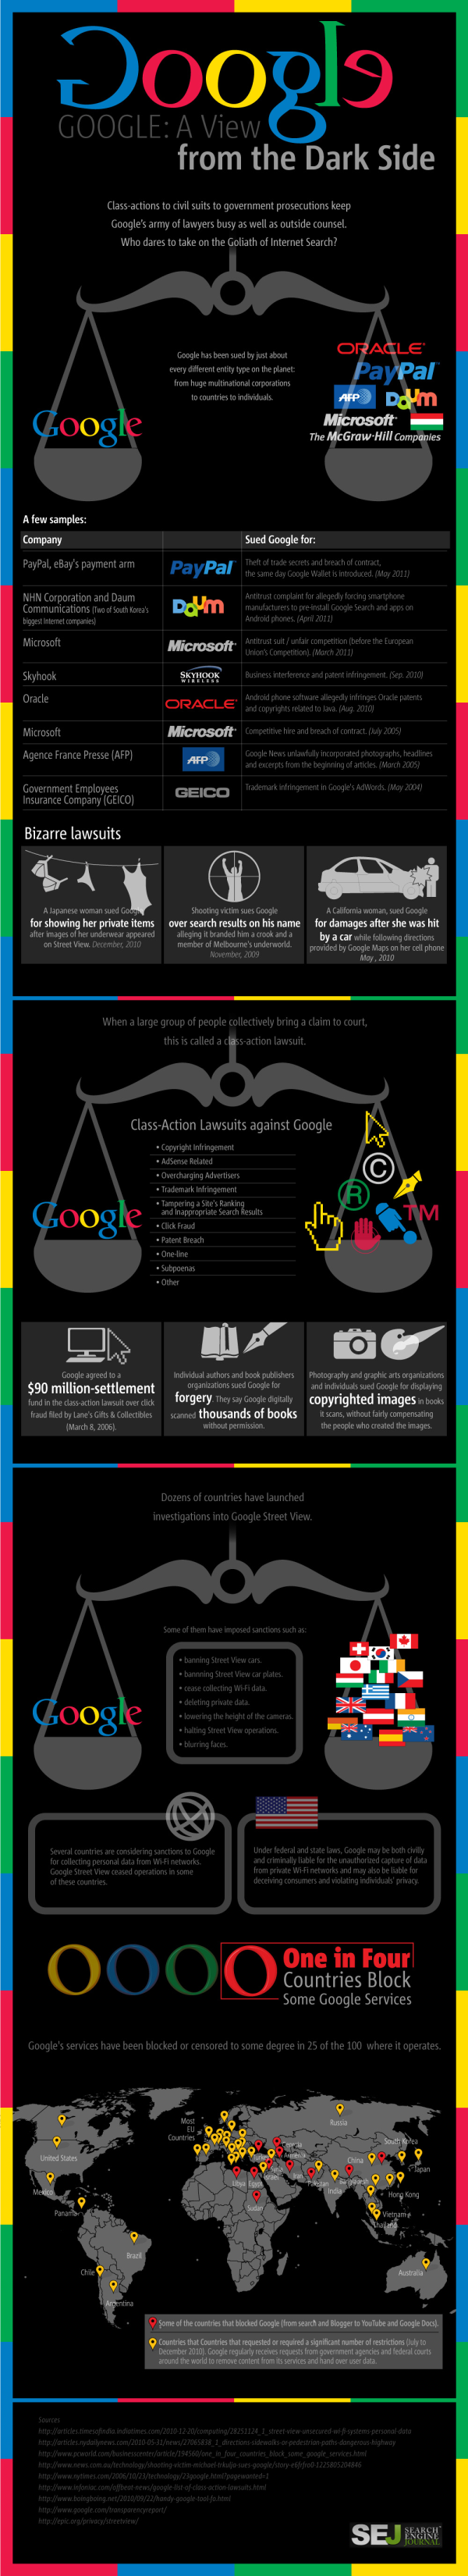 google legal battles infographics consultants edtx texas patent